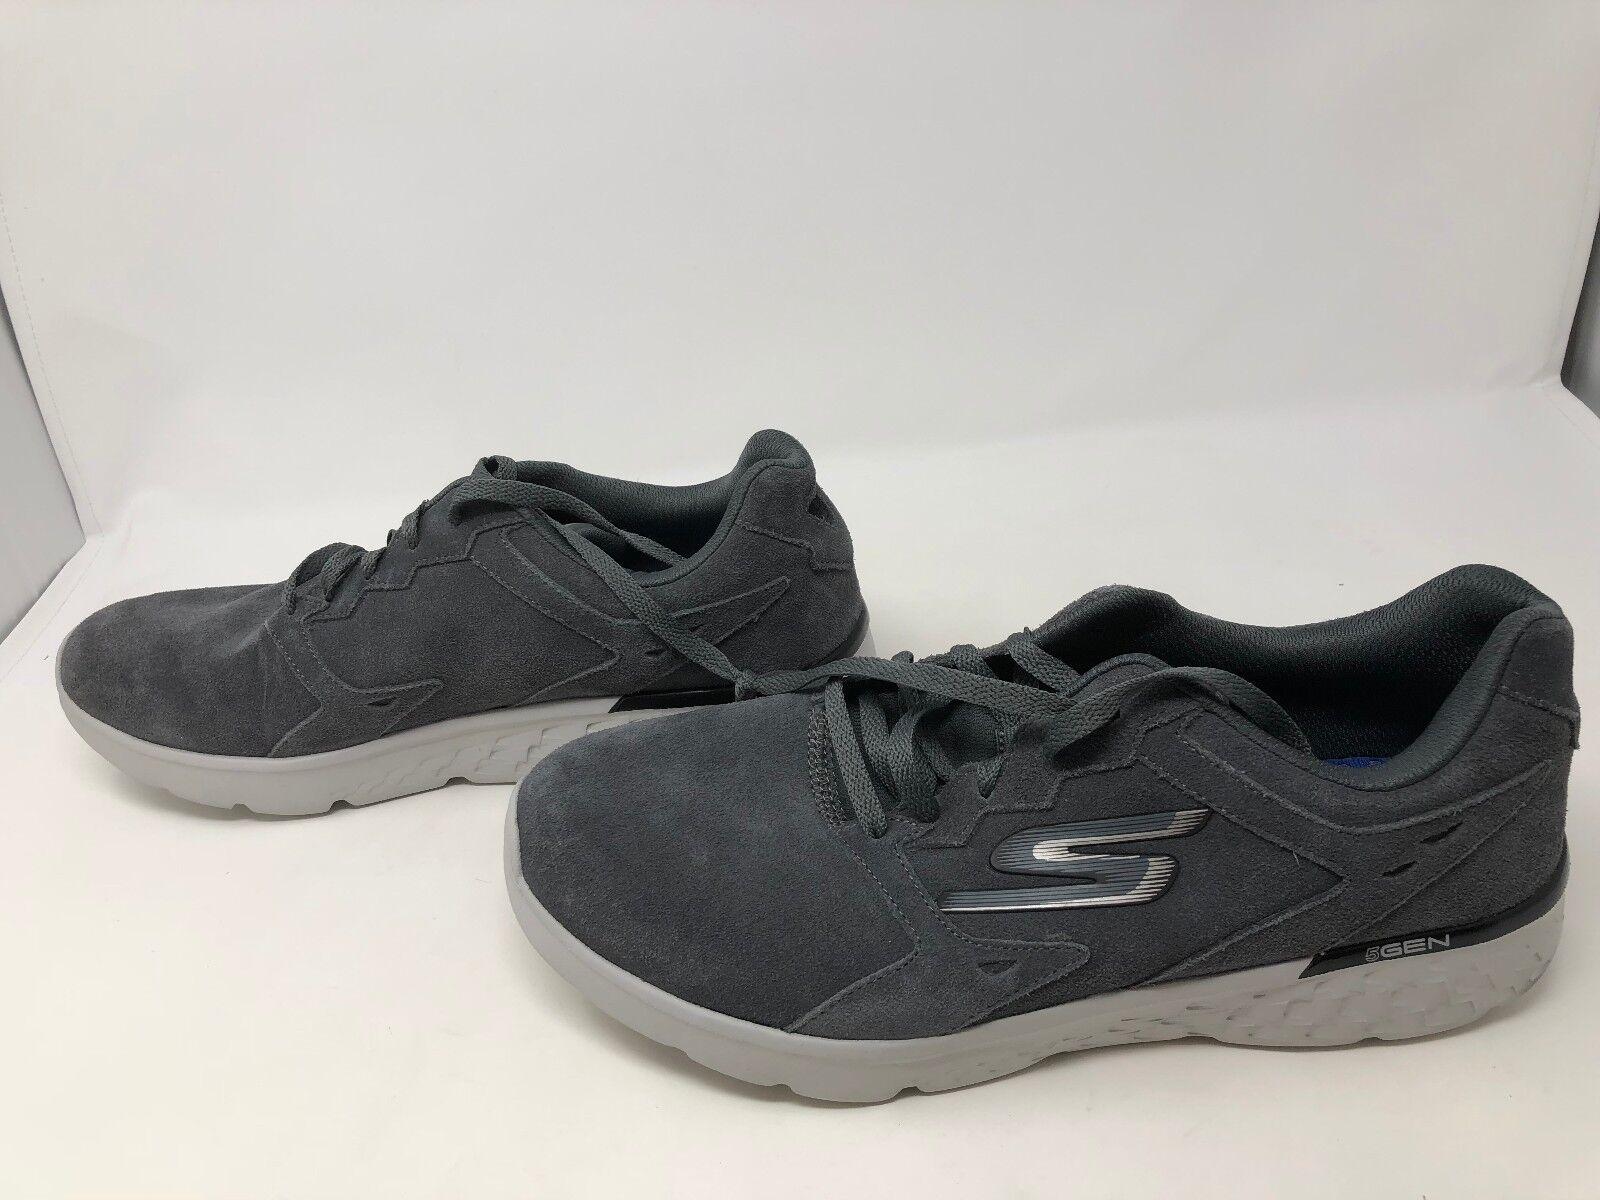 Hombre Skechers zapatos Gorun 400 SWIFT gris zapatos Skechers 14T 6de394